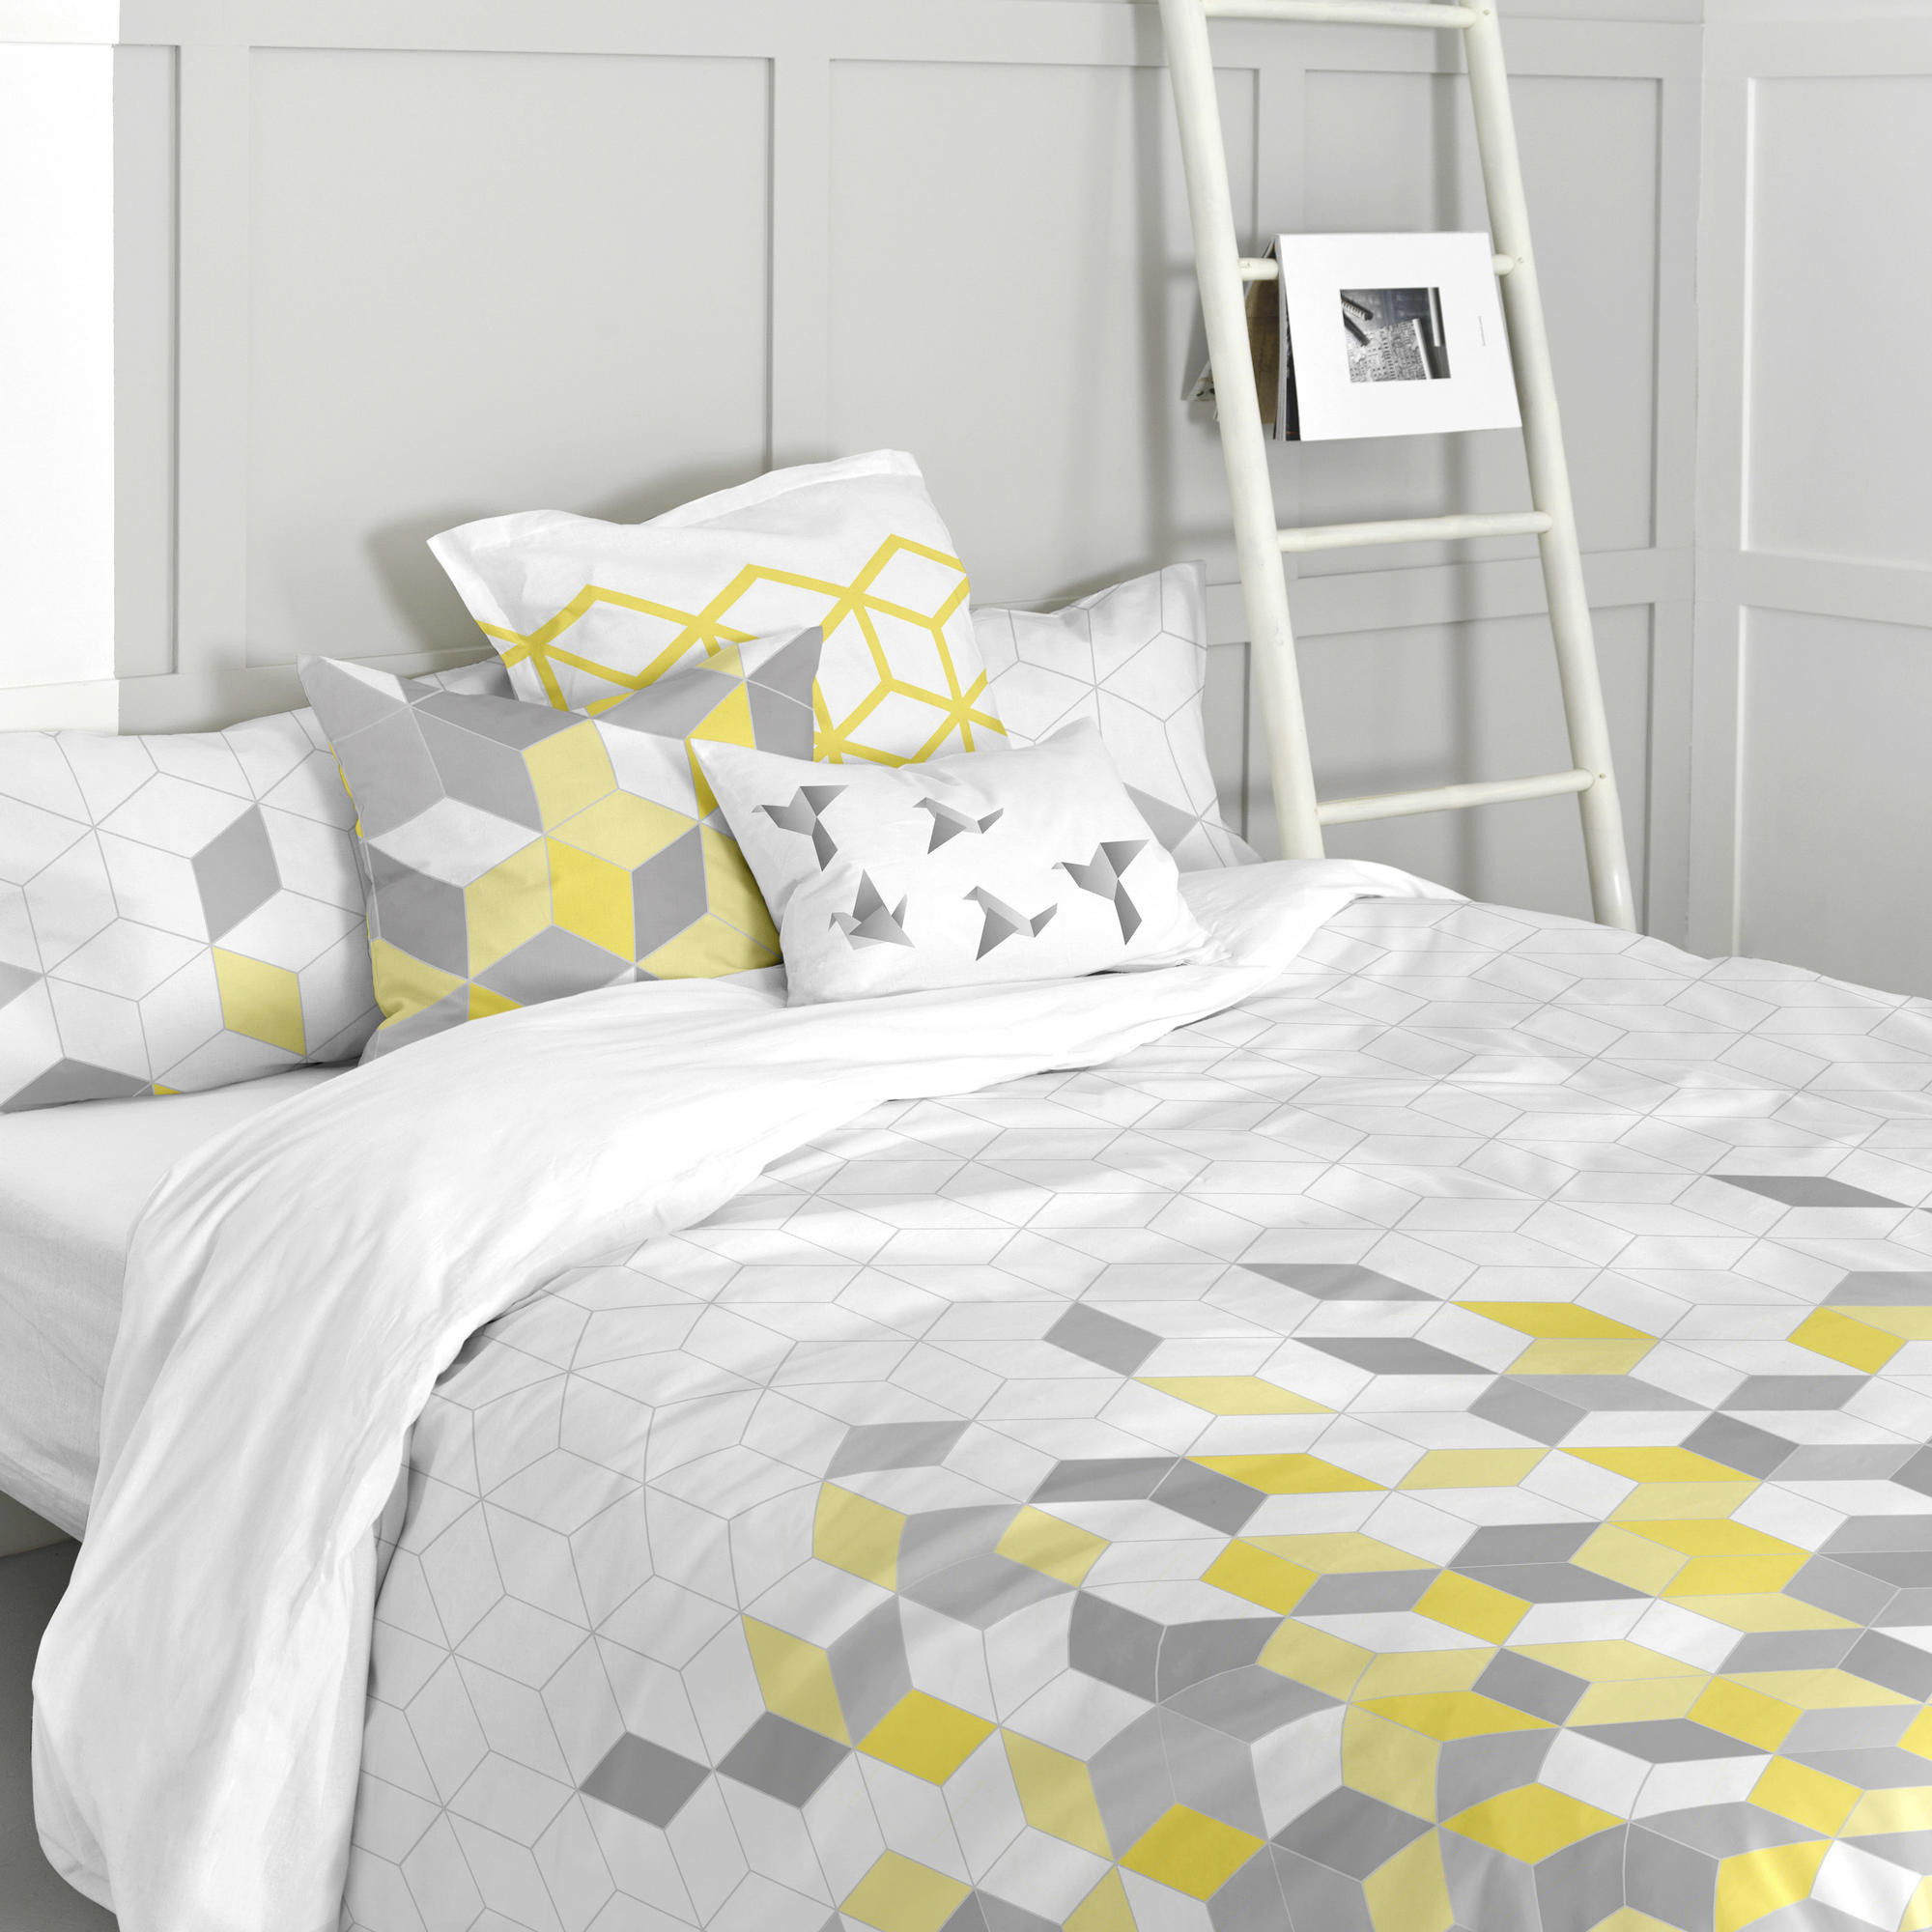 Bettbezug | Symmetrie-140 x 200 cm